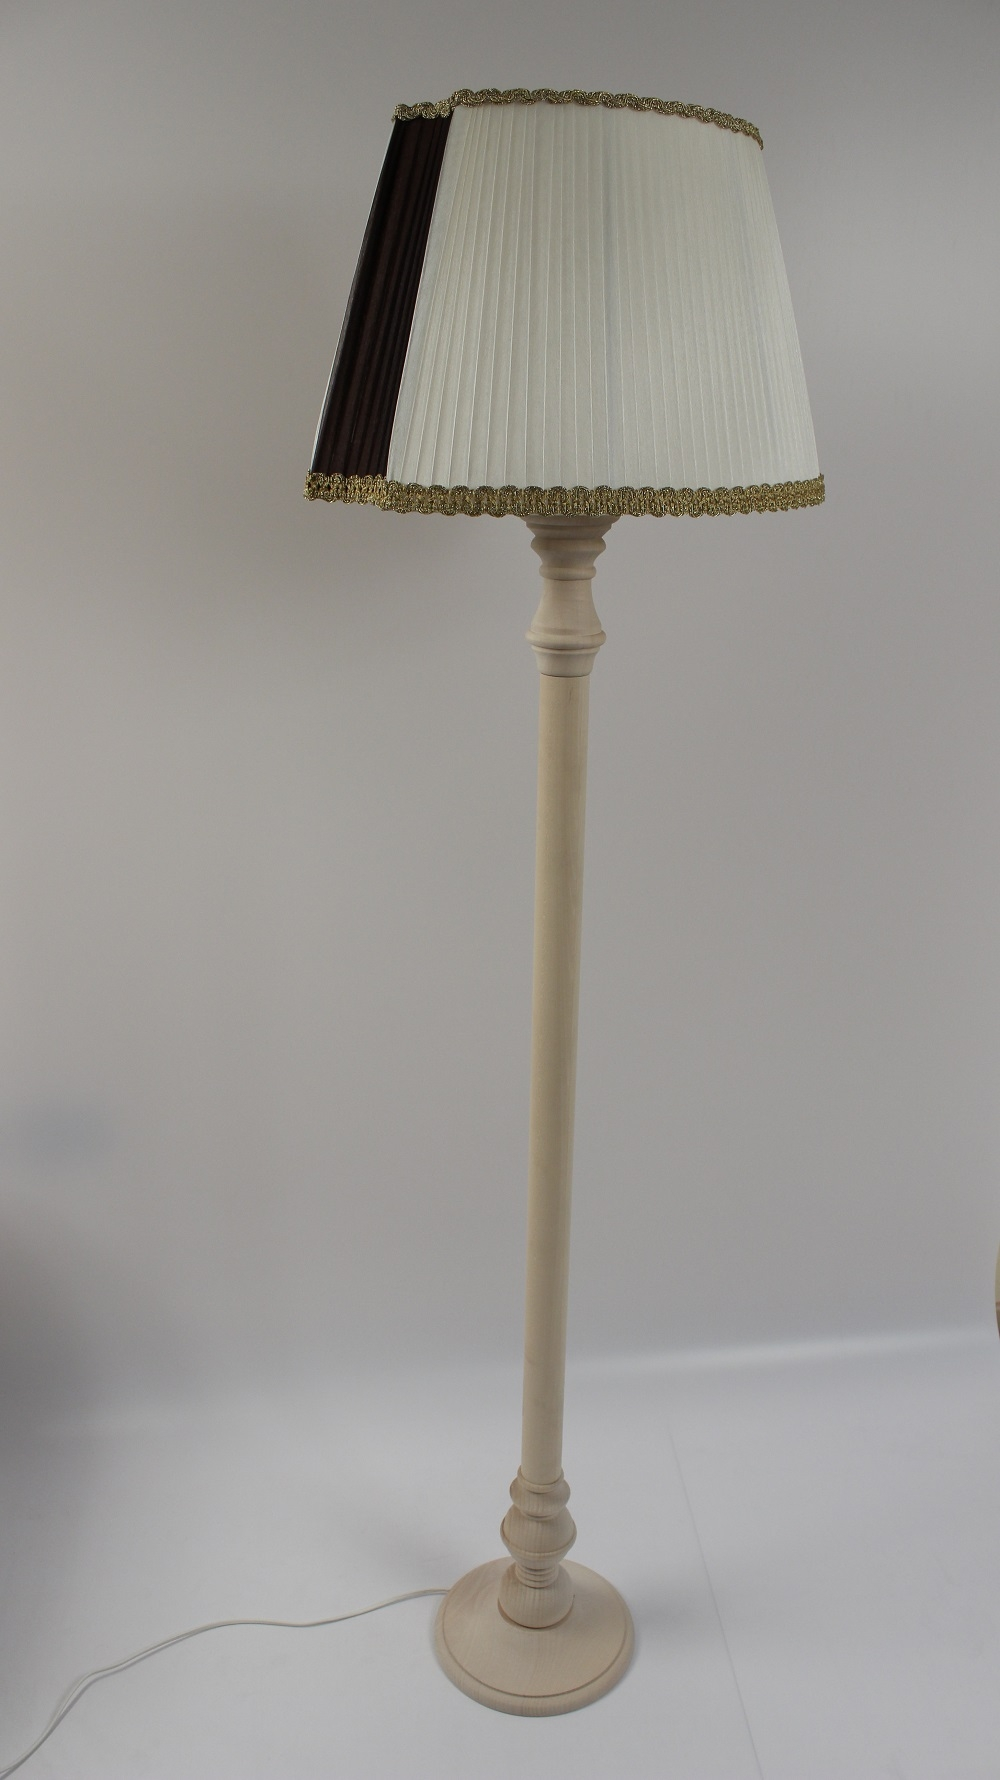 Cappelli per lampade ikea una collezione di idee per for Piantana ikea